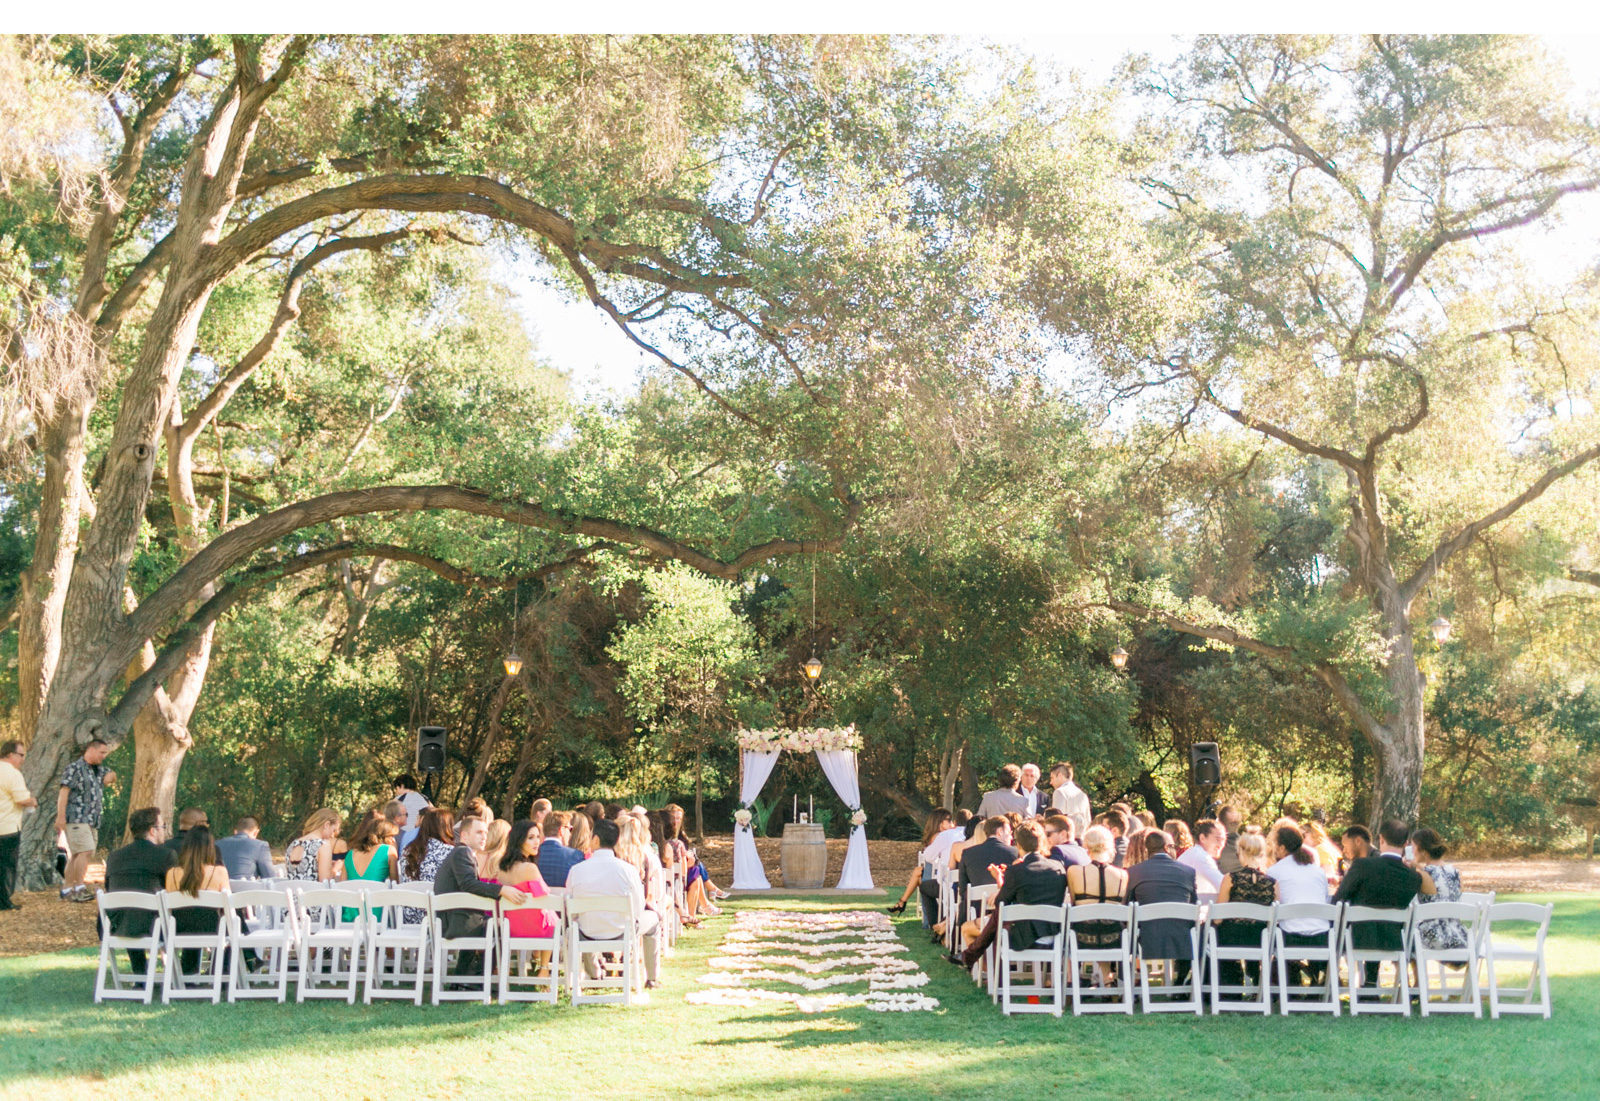 Nia-Sanchez-Wedding-Natalie-Schutt-Photography_03.jpg